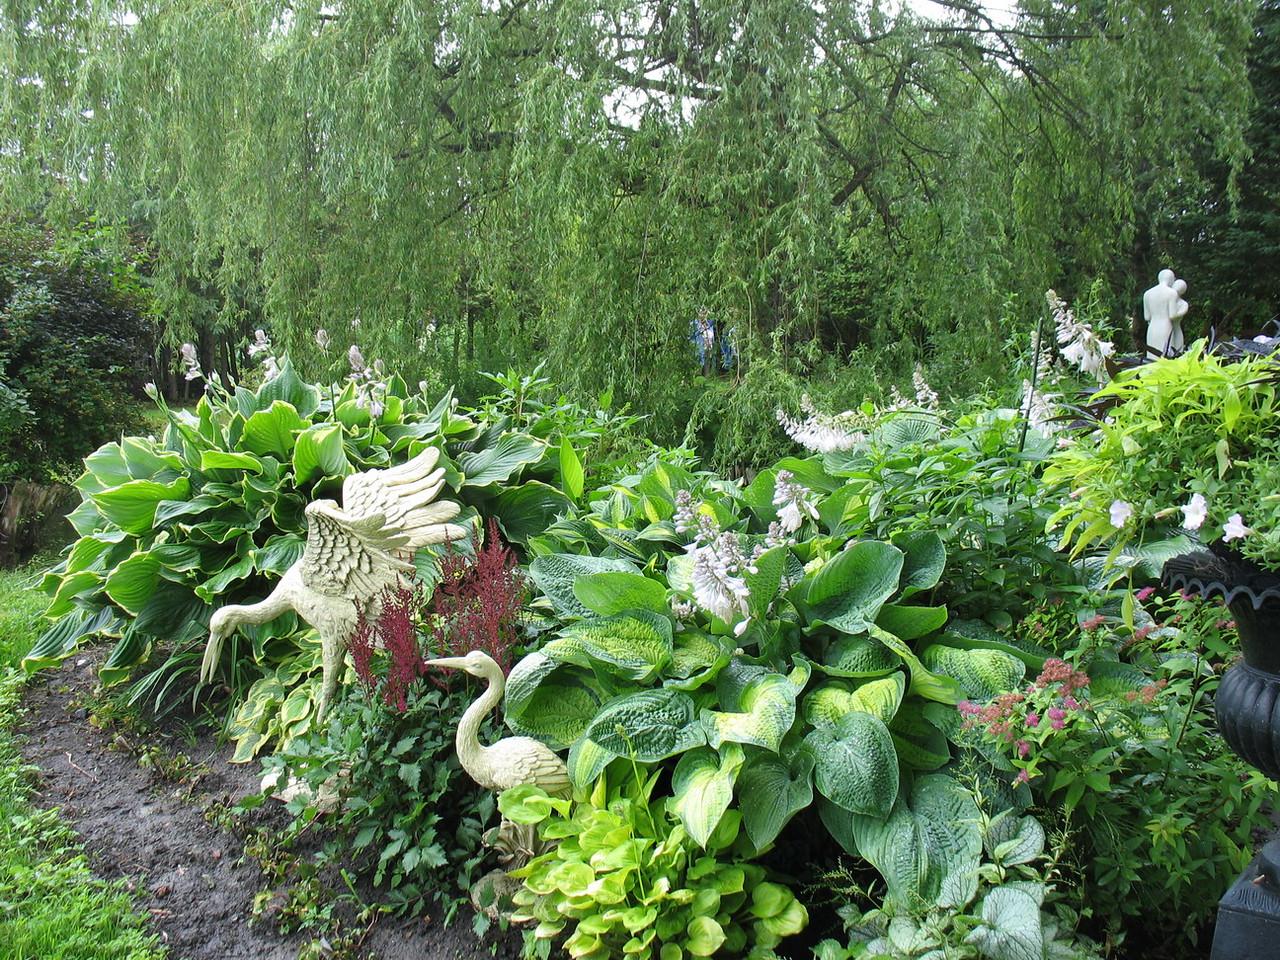 I enjoyed the large hostas and the garden art.